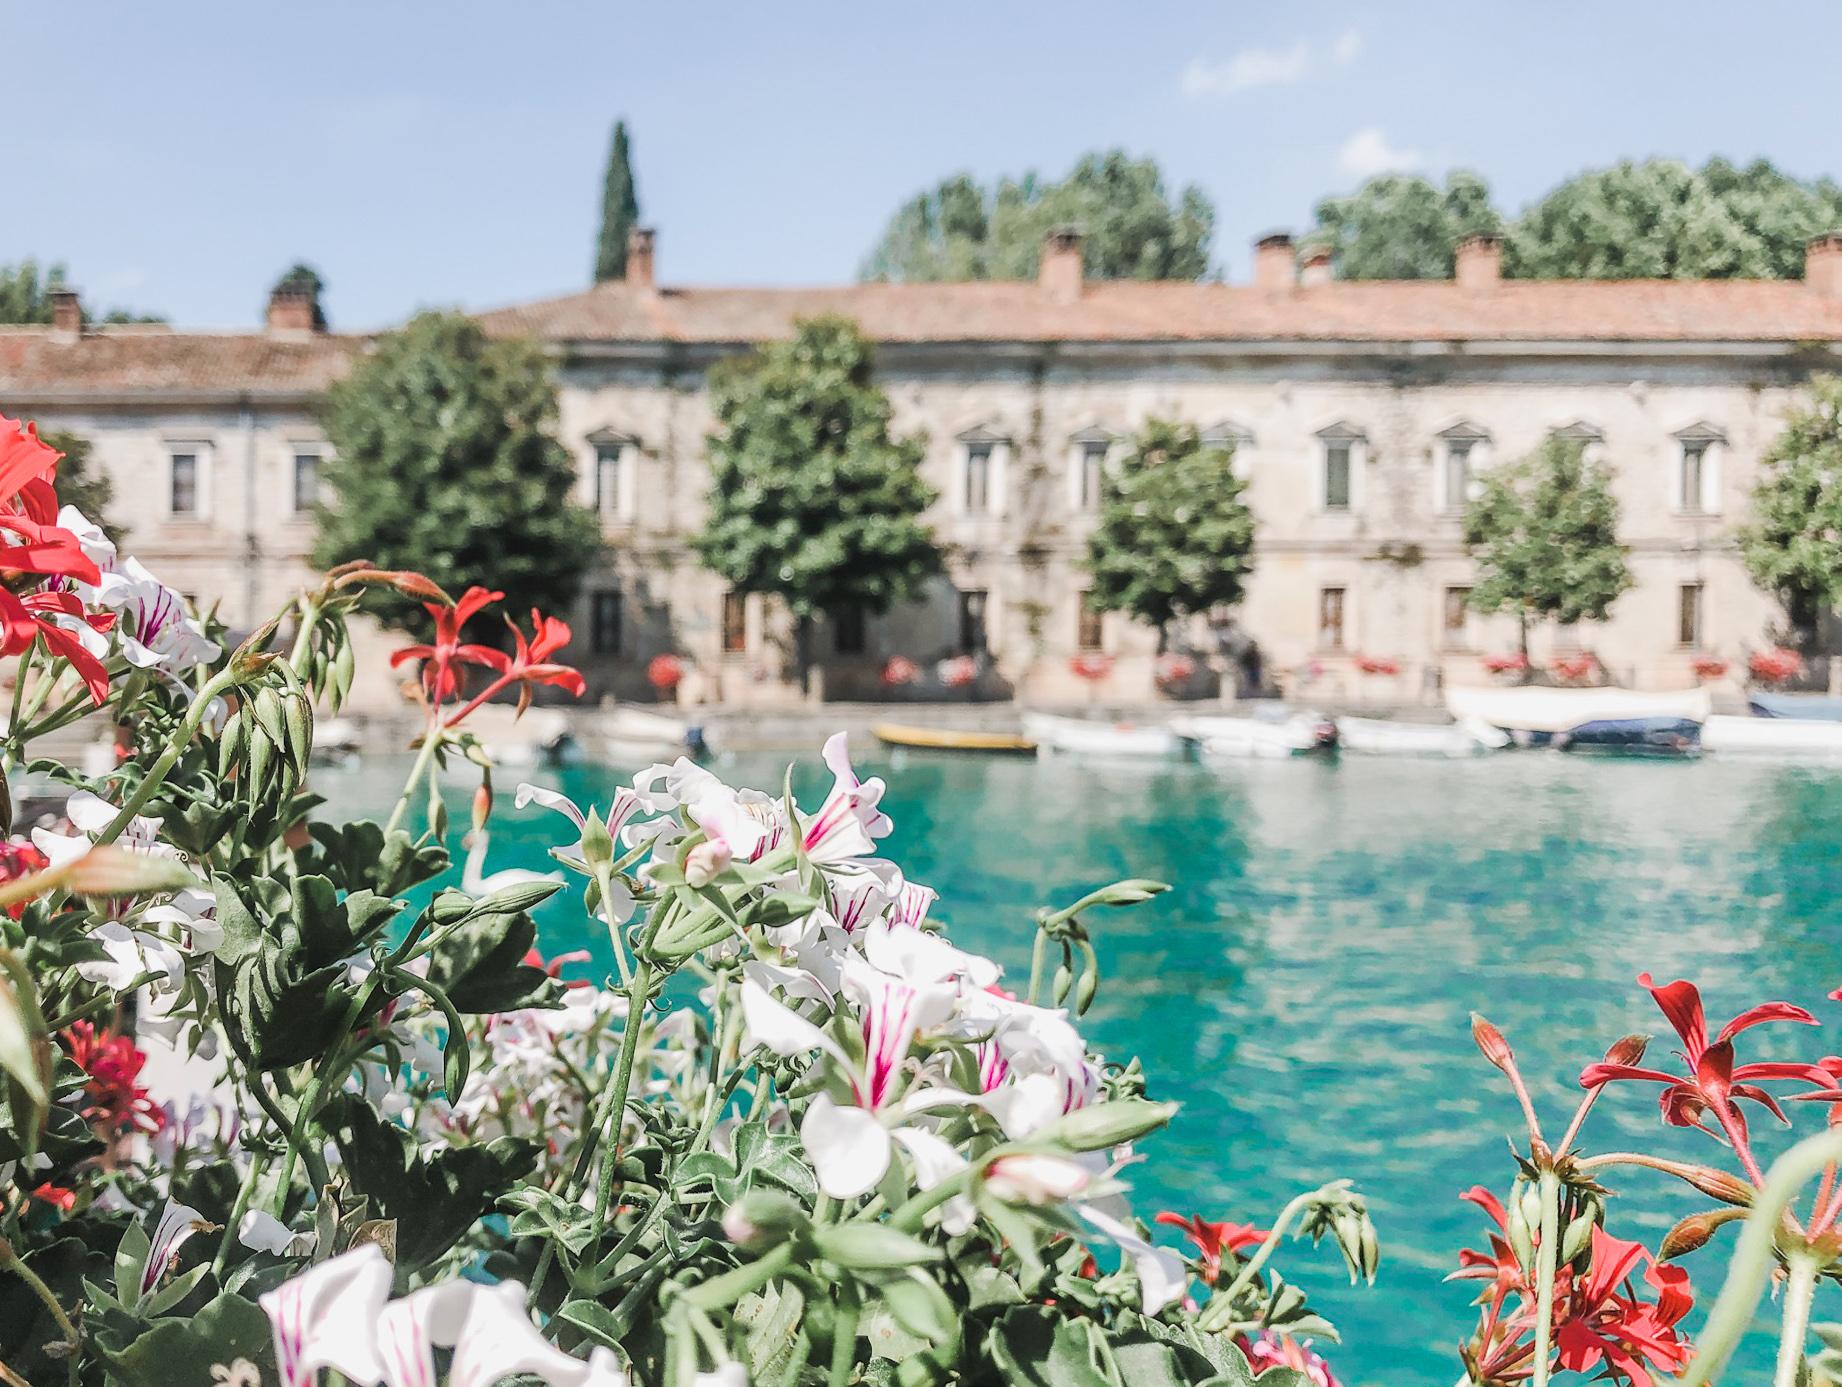 Lake Garda | happilycuratedchaos.com | happily curated chaos